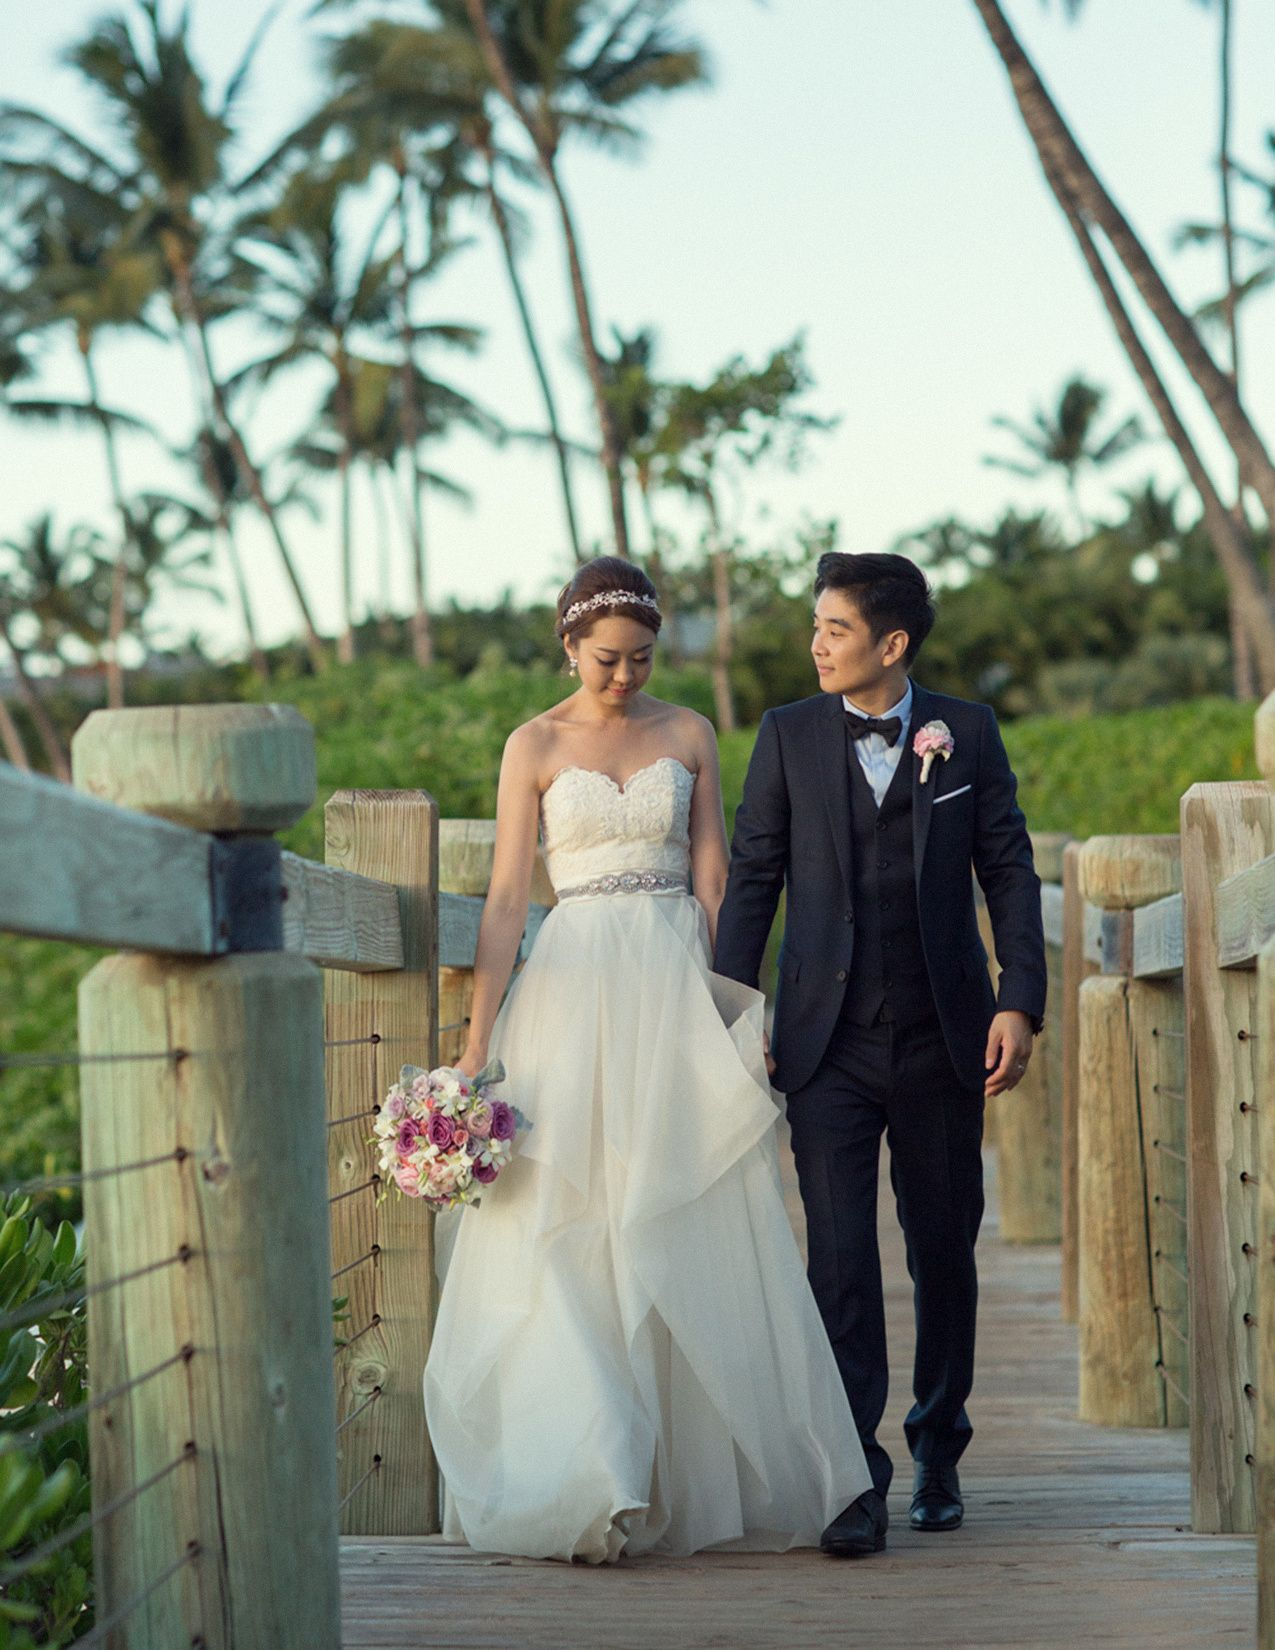 Mykle Coyne Hawaii Bridal Resort Hotel Wedding Photography Details Maui Portrait Beach Bridge Palm Andaz